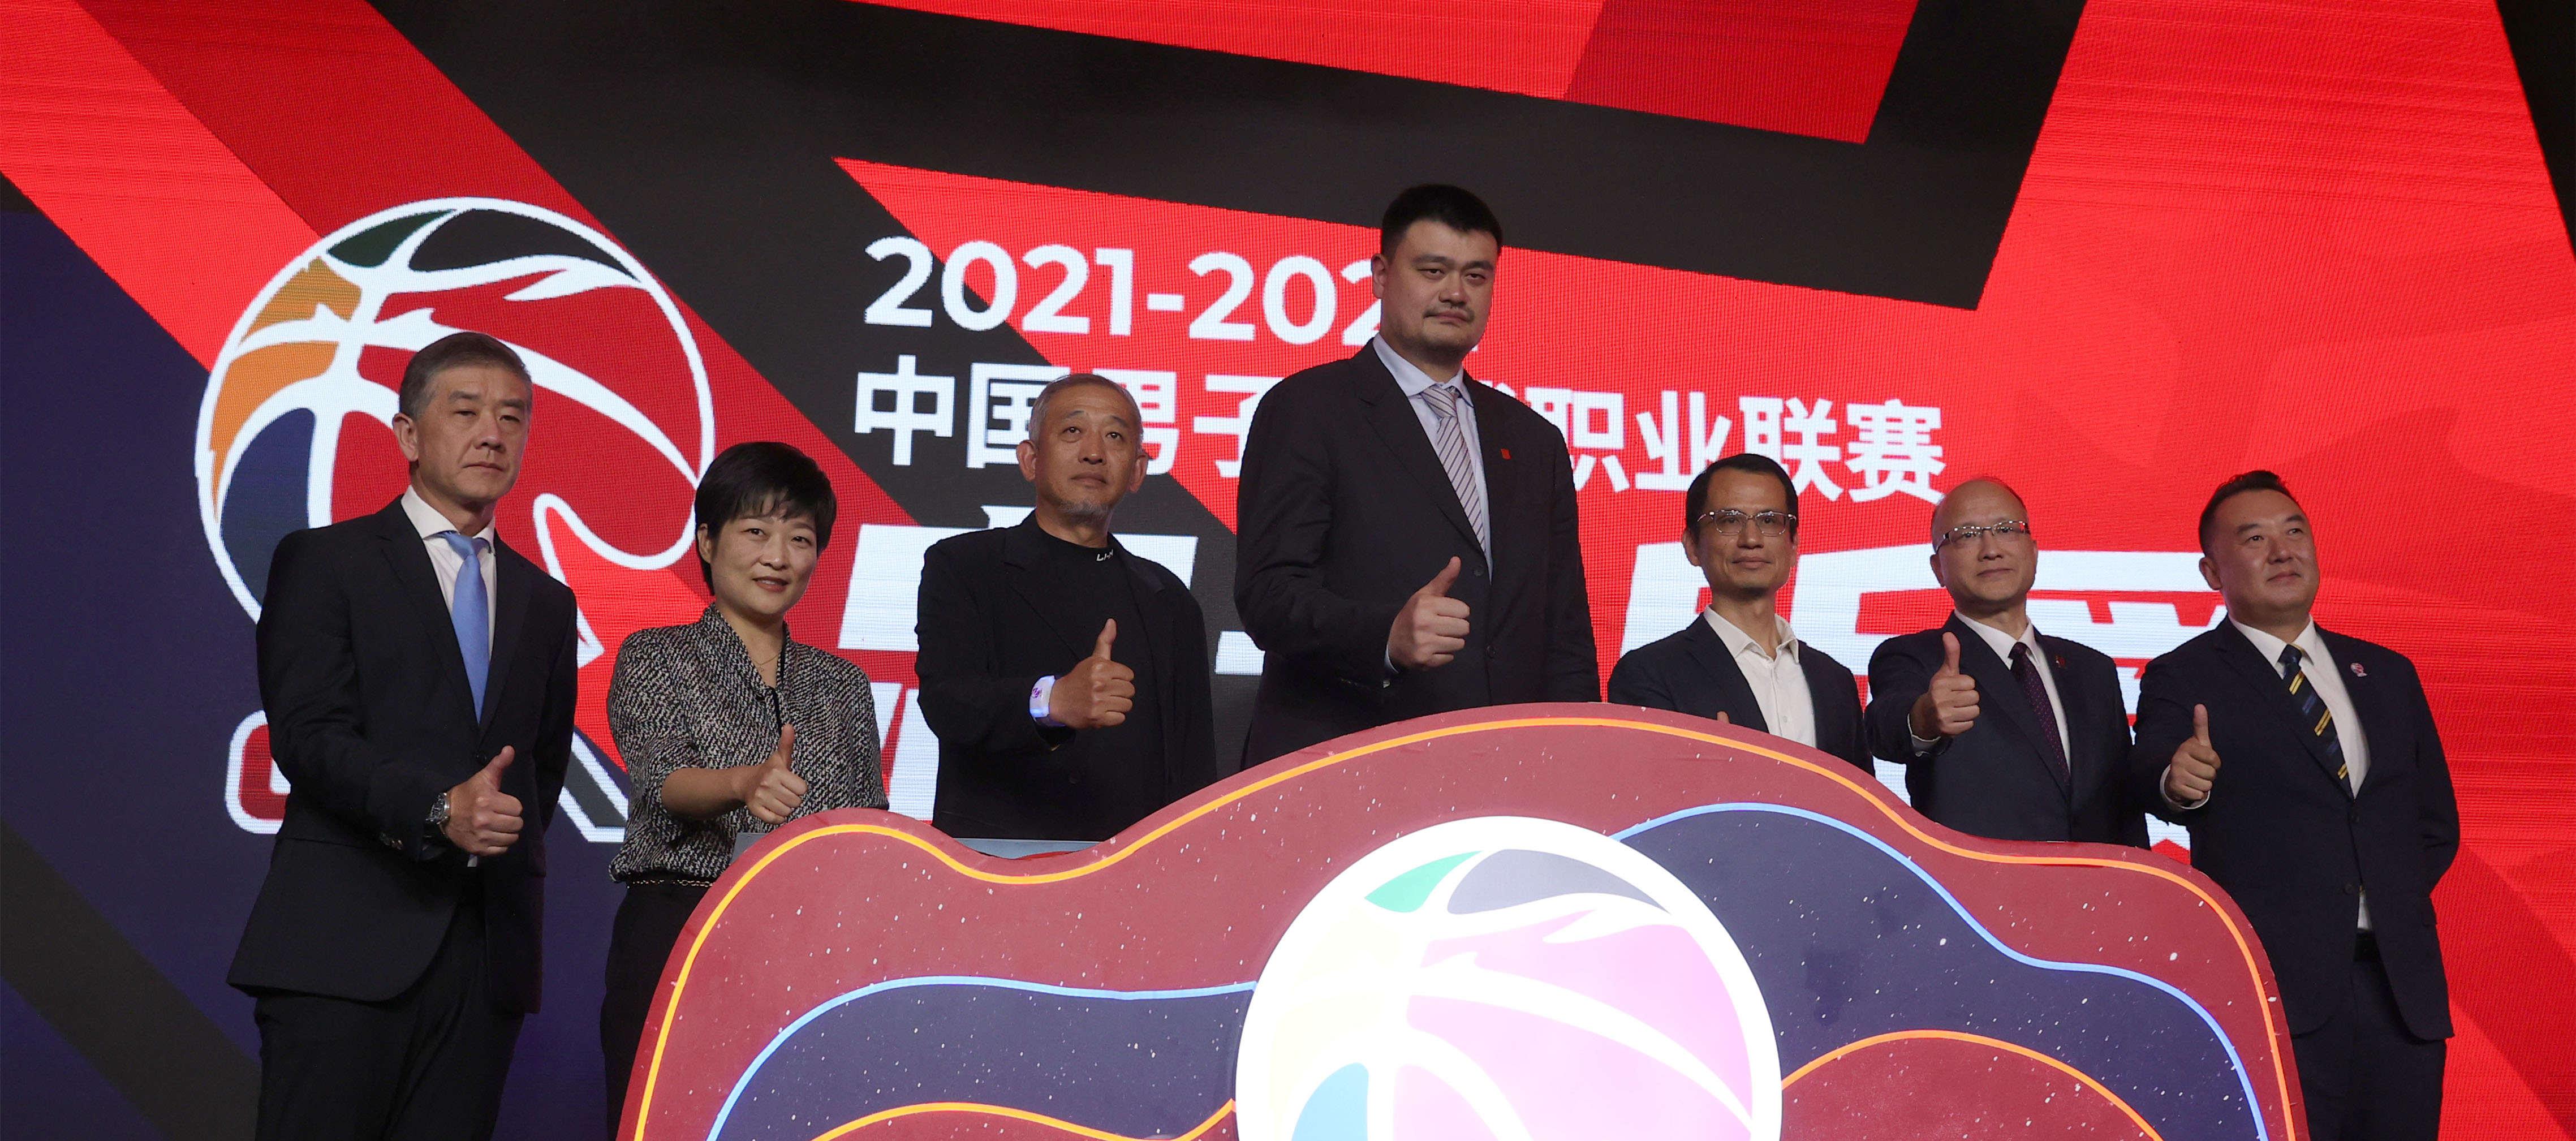 CBA新賽季新聞發布會在京舉行